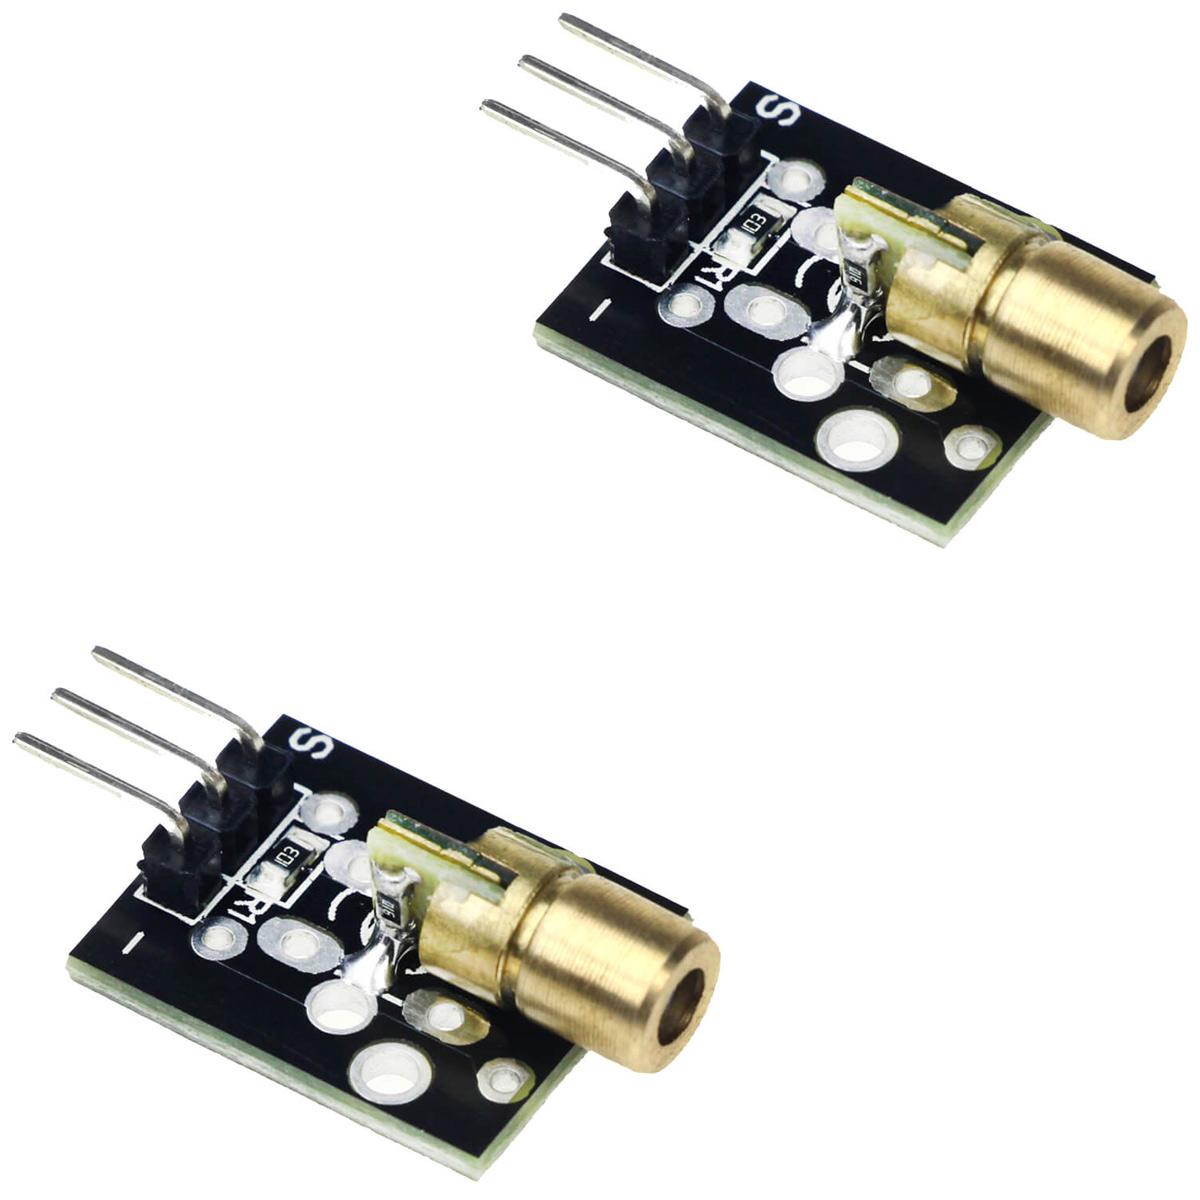 2x Módulo Laser 6mm 5mW Vermelho KY-008